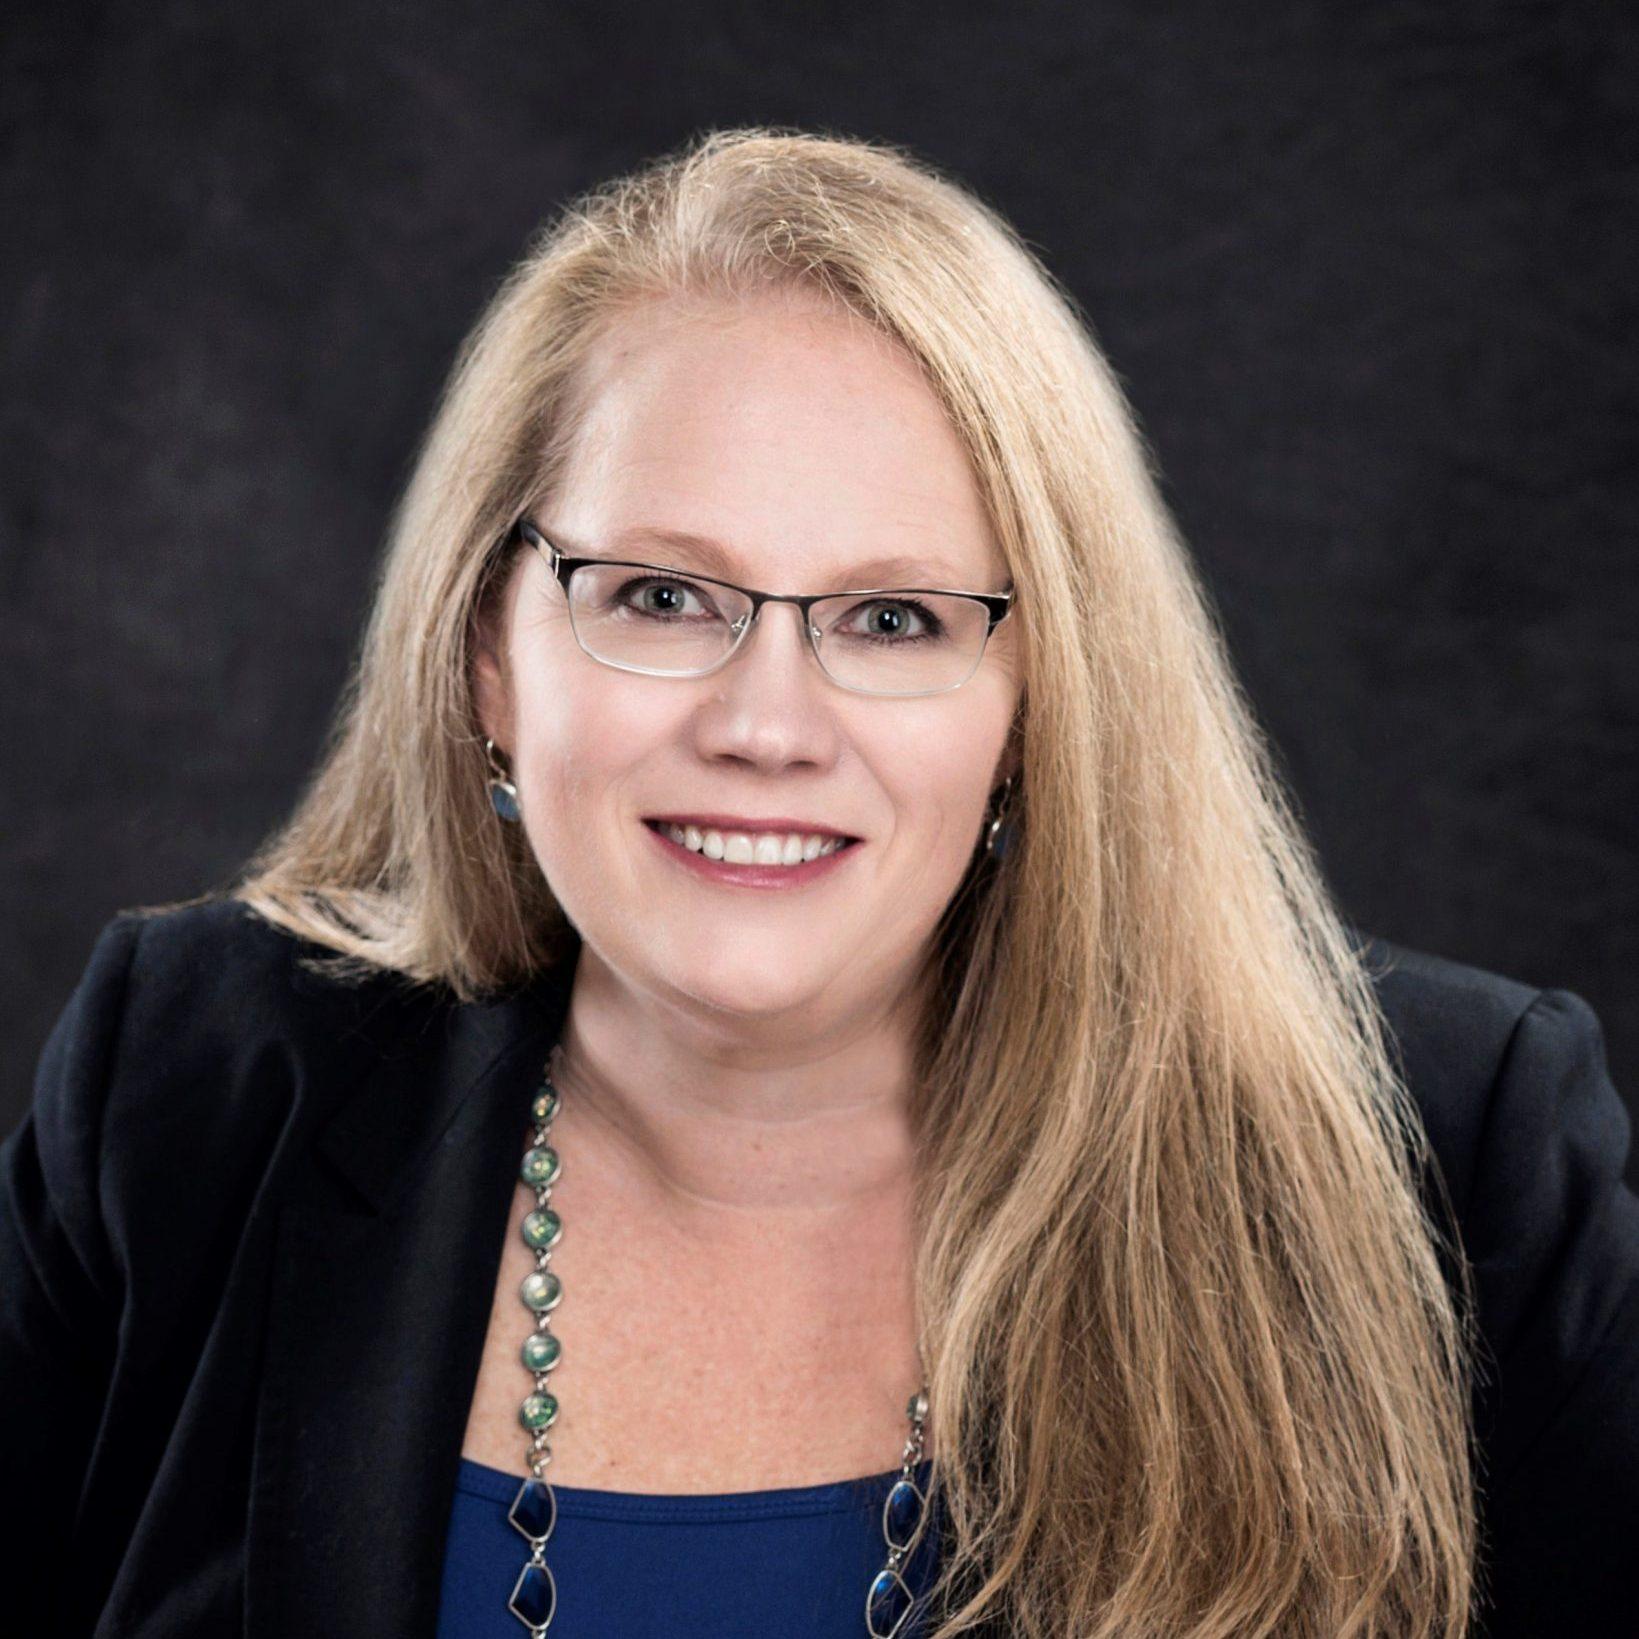 Heidi Brownell